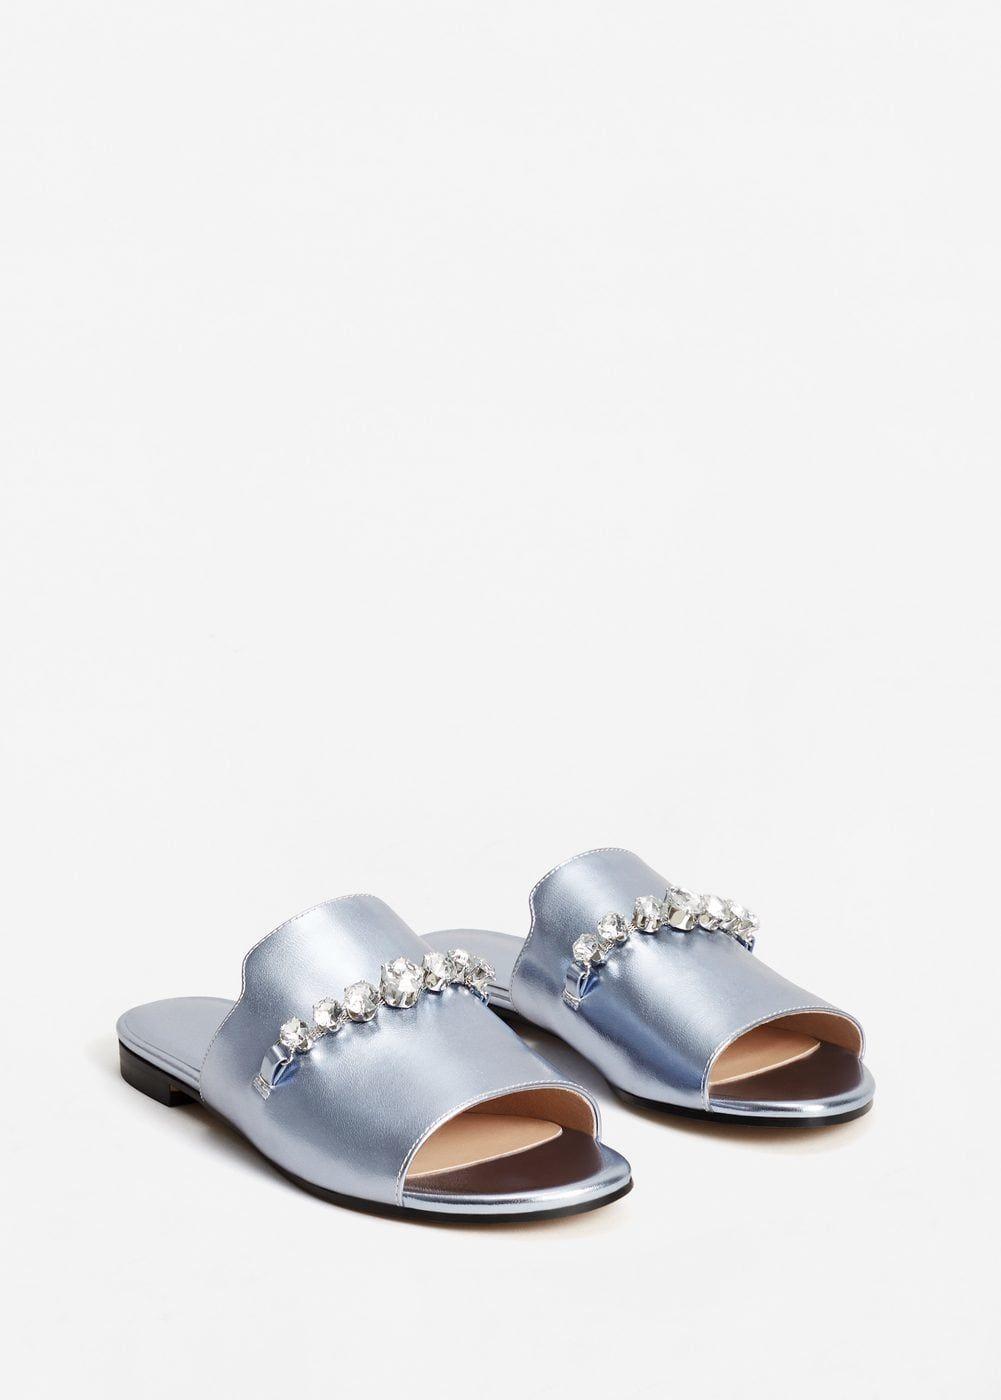 Crystal metallic sandals Women | Metallic sandals, Shoes